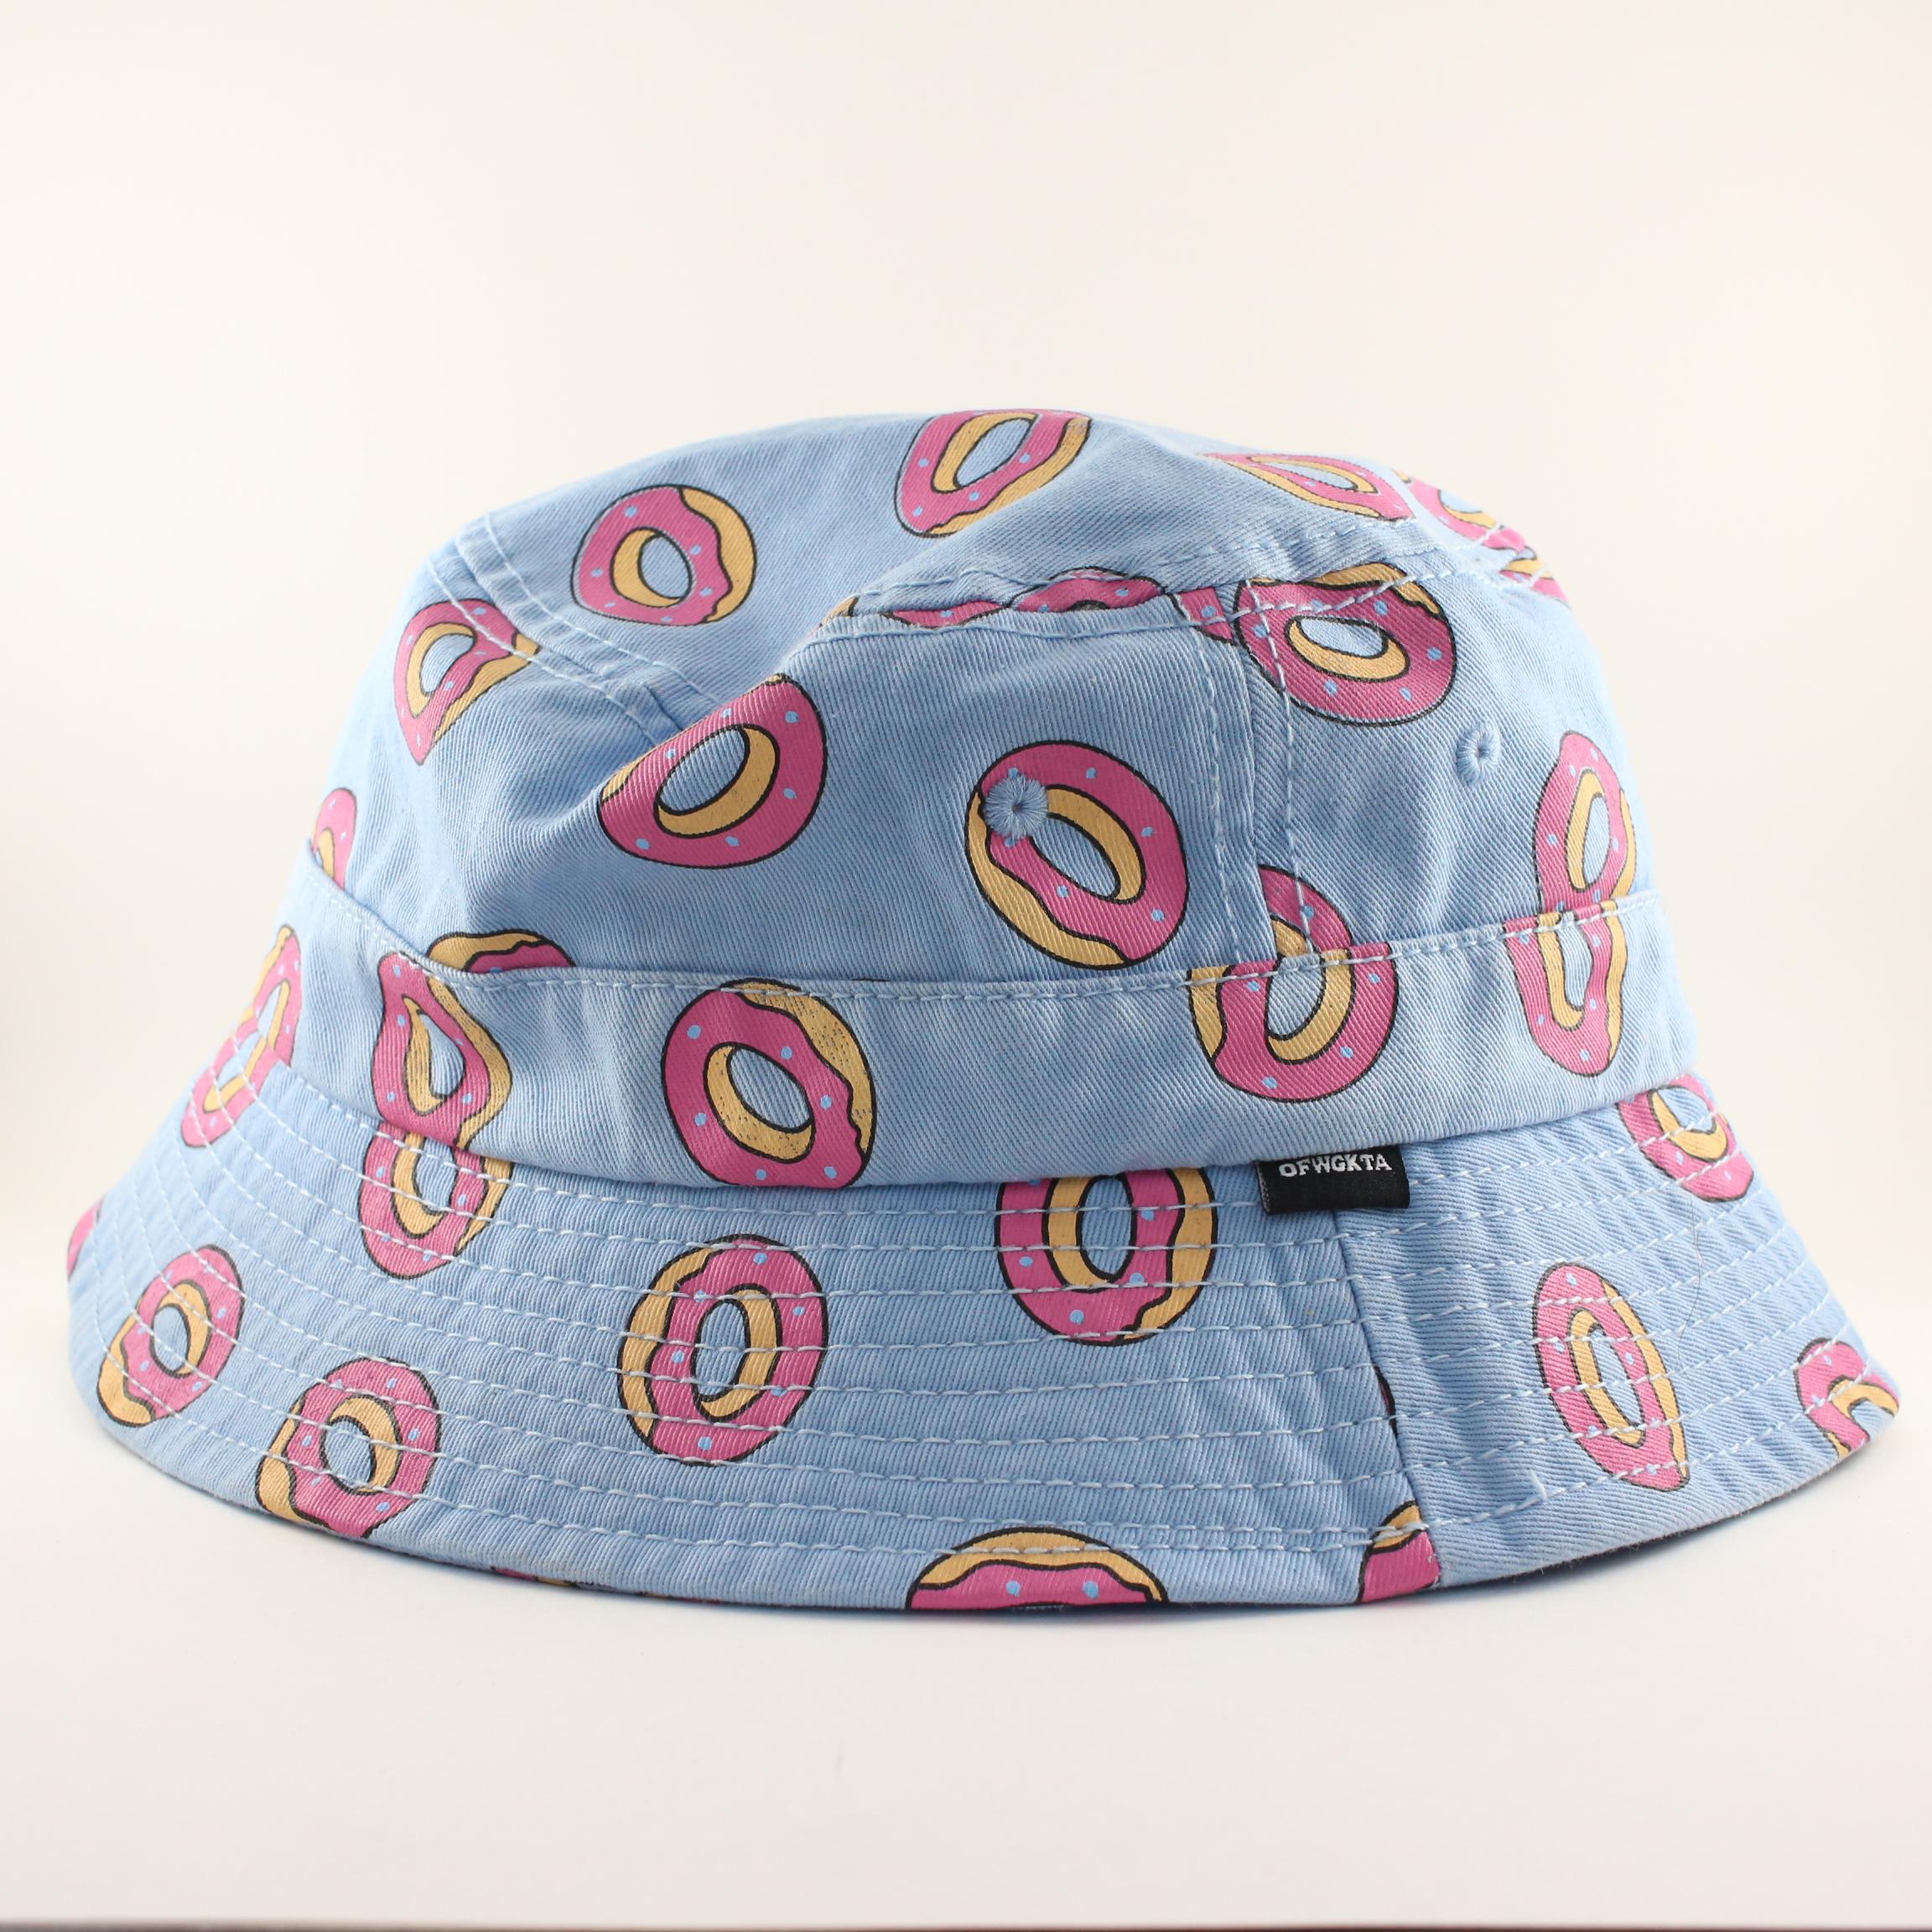 301bbd6bf074 Odd Future ×. Odd Future Donut Bucket Hat Tyler The Creator Golf Wang ...